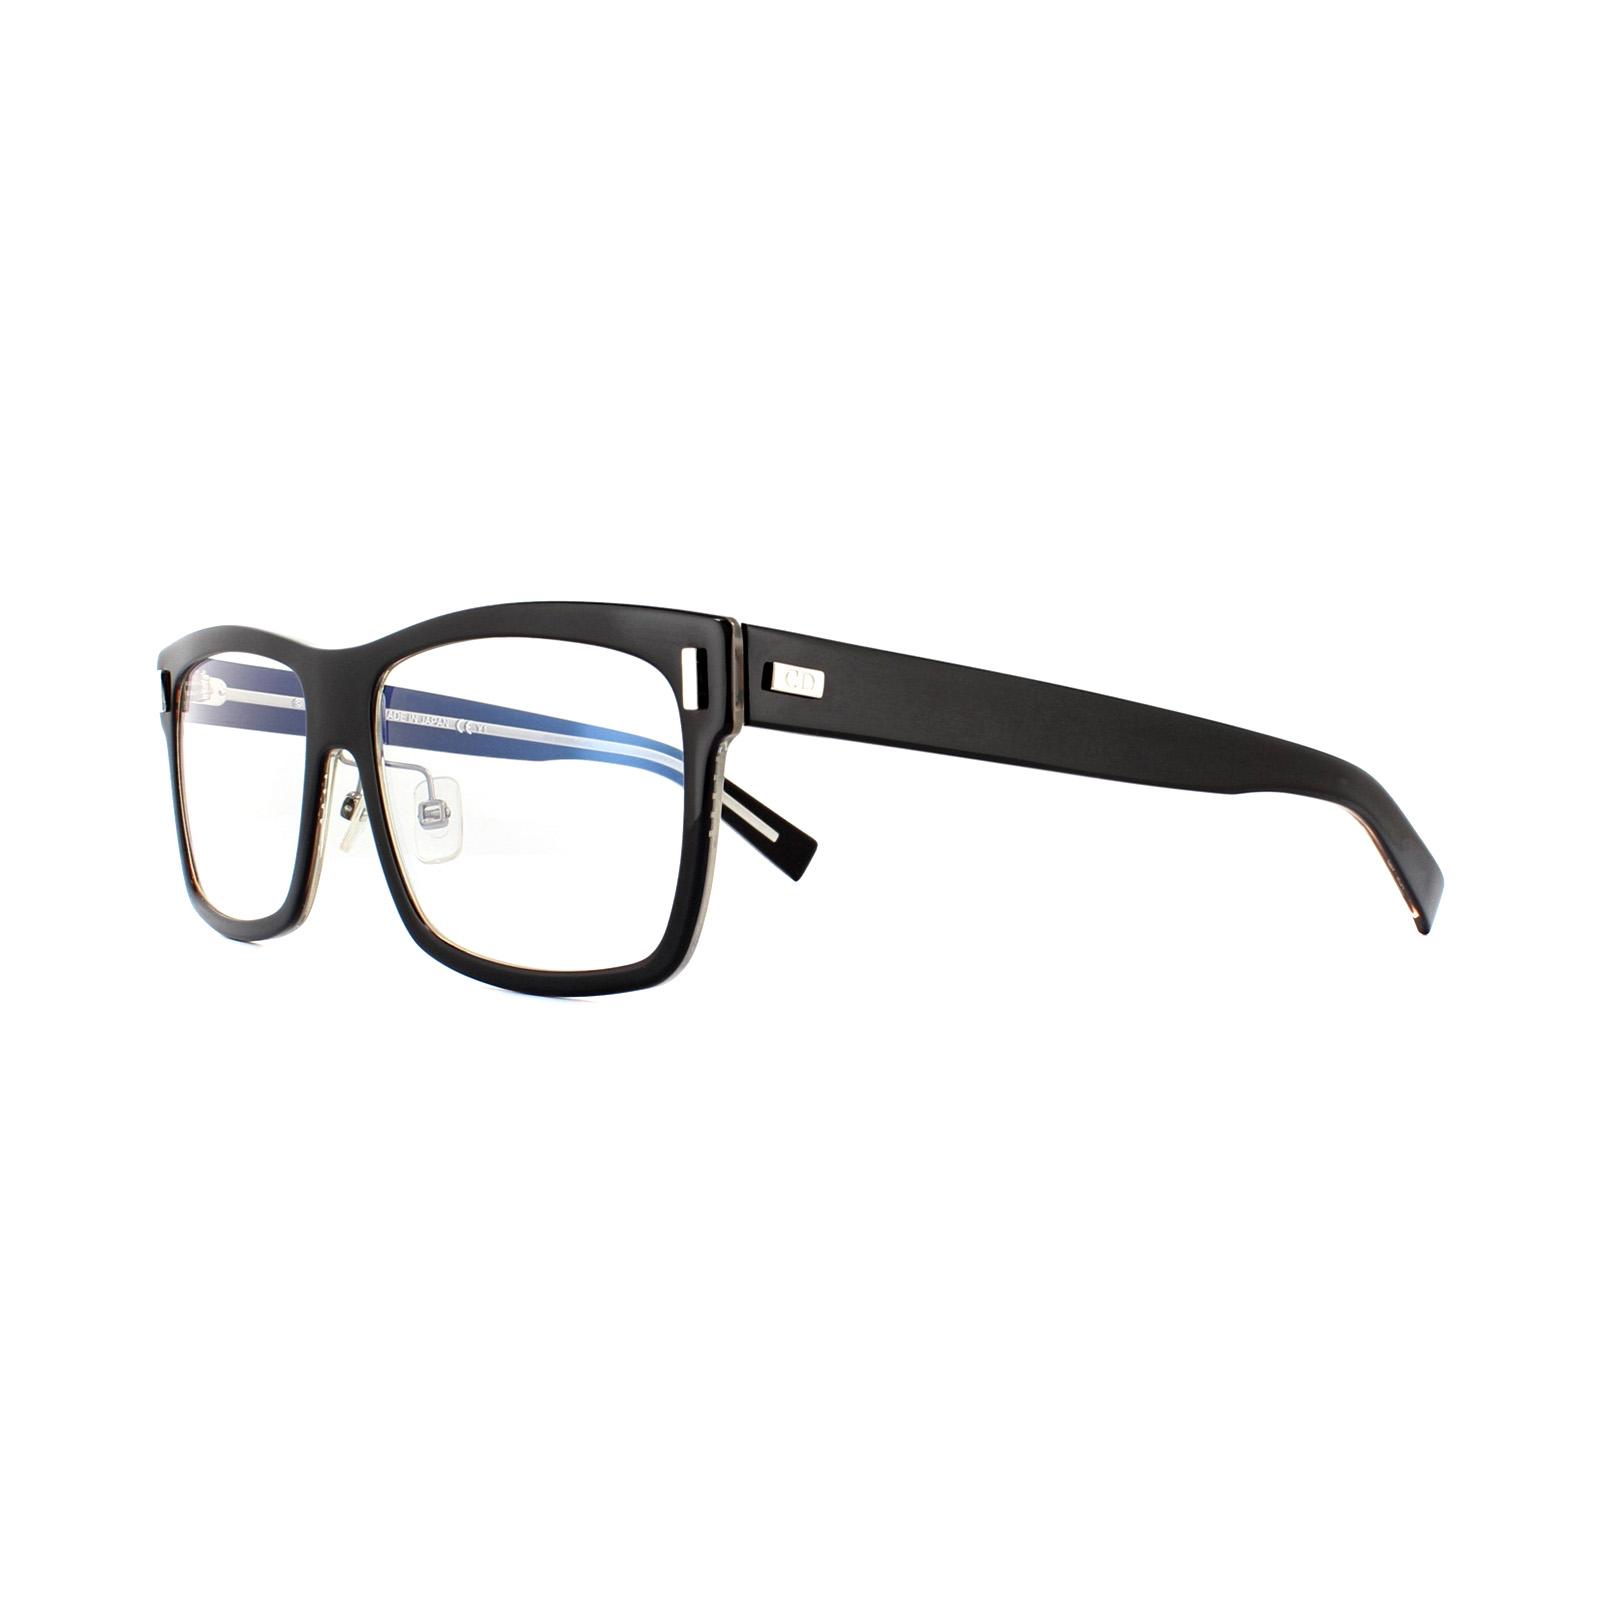 a4c82acd7f Sentinel Dior Homme Glasses Frames Dior Blacktie 2.0 B 7C5 Black Crystal  55mm Mens